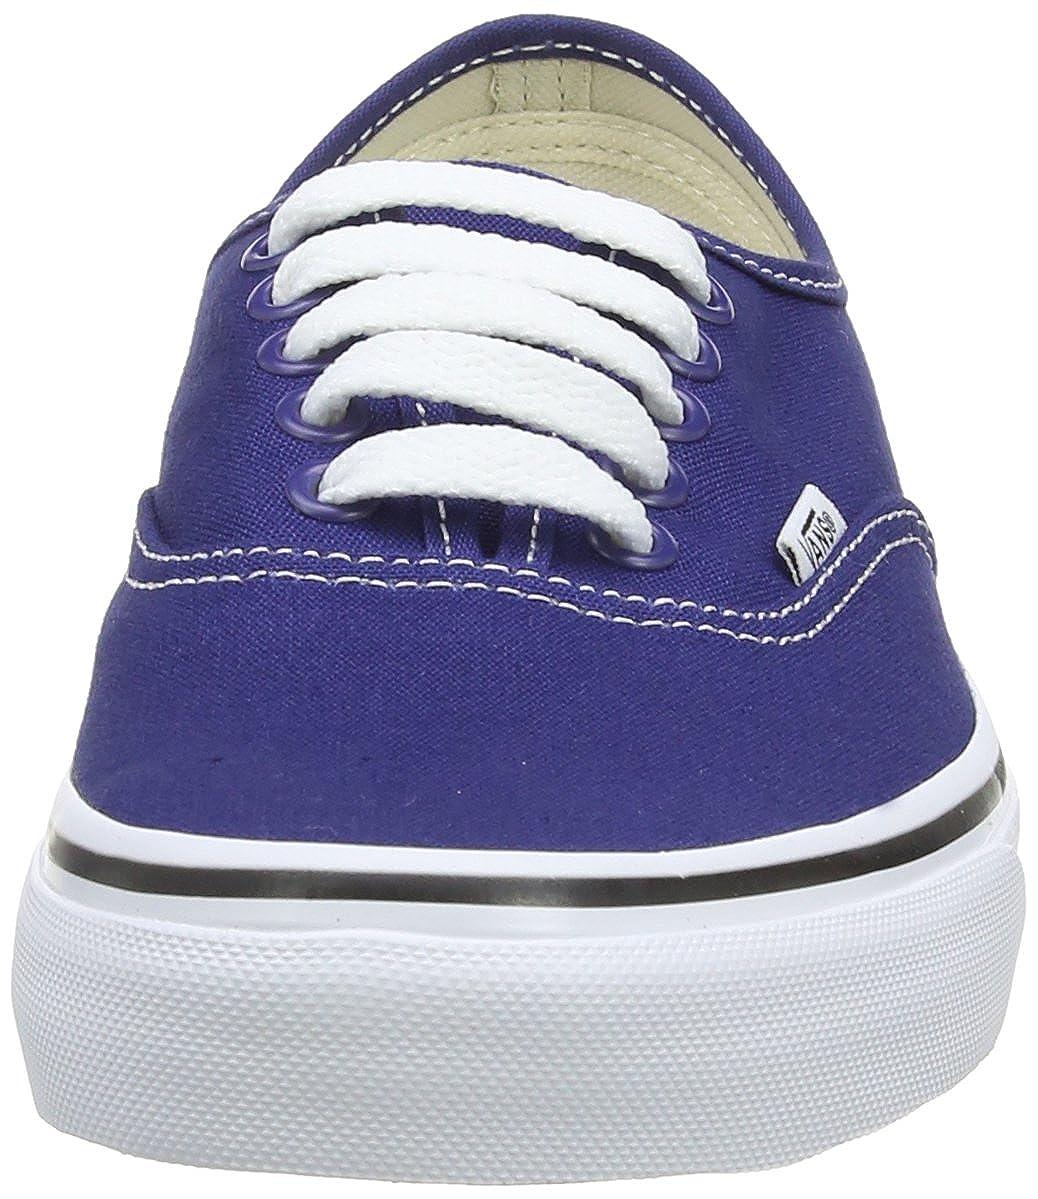 CHAUSSURES - Sneakers & Tennis bassesCar Shoe qZOXl